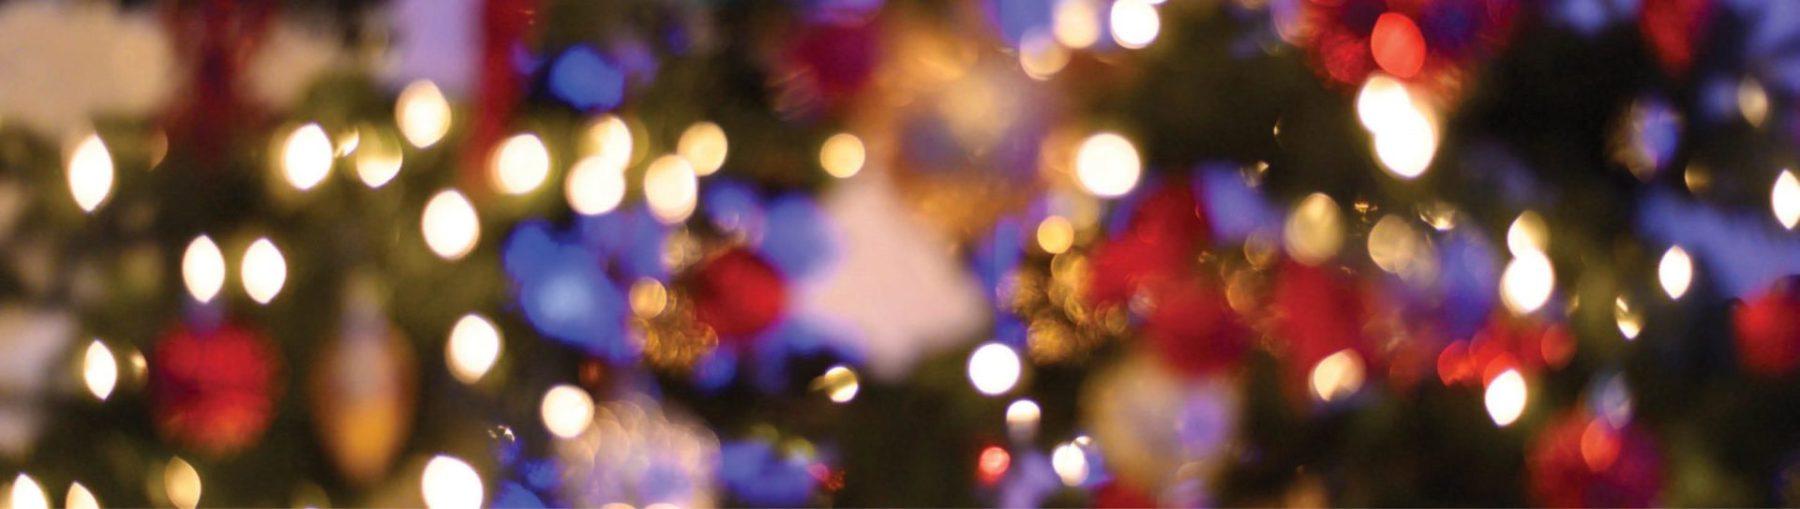 twinkling holiday lights